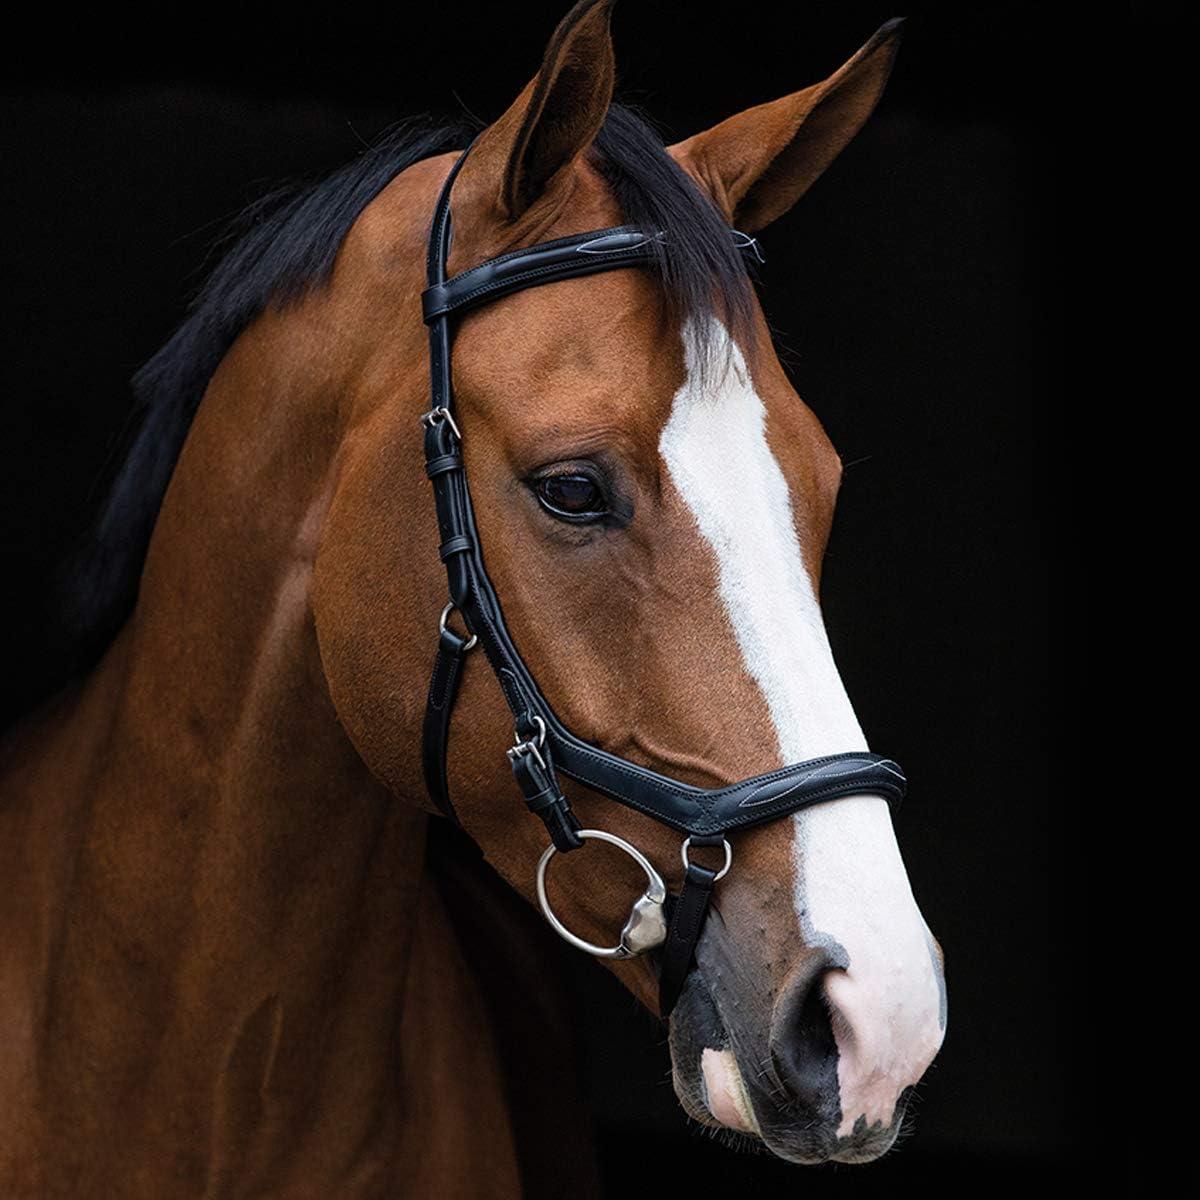 Horseware Rambo Micklem Deluxe Competition Bridle Trense Farbe und Gr/ö/ße w/ählbar